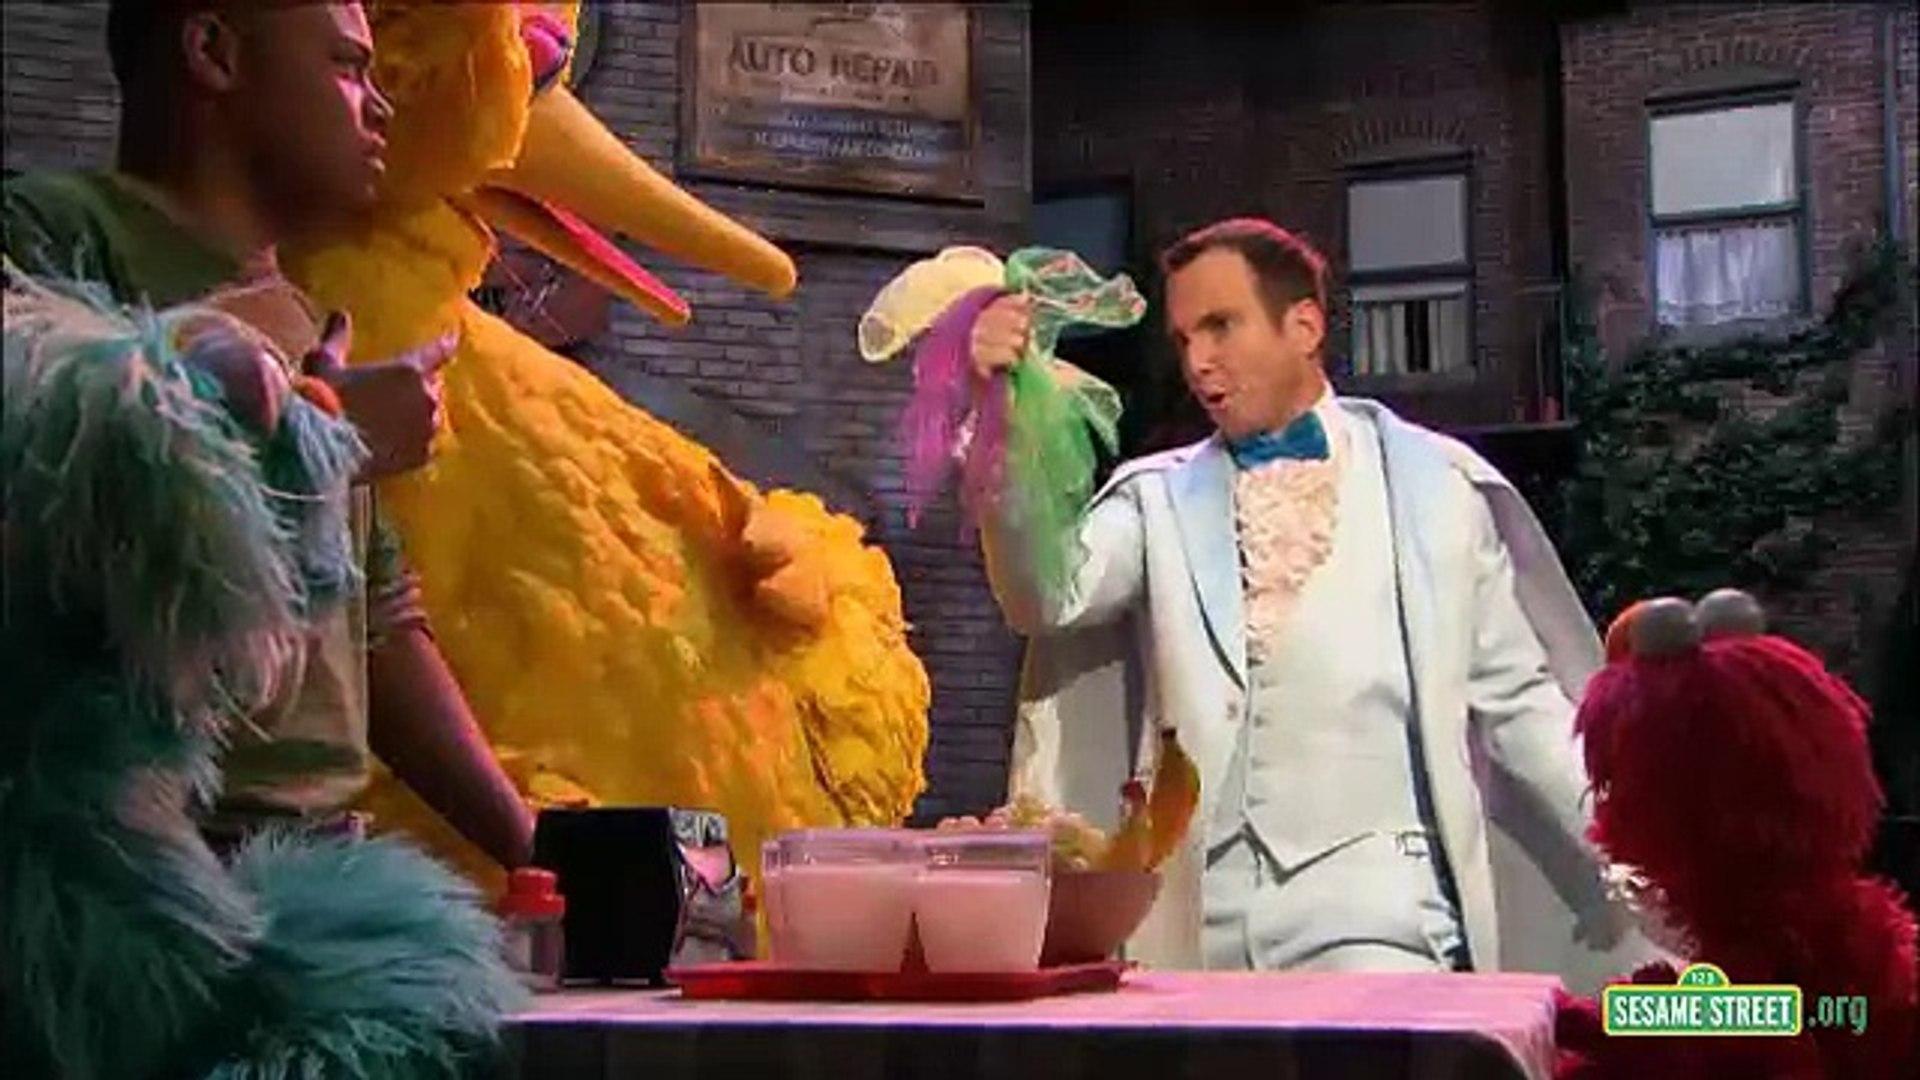 Sesame Street - Max the Magician